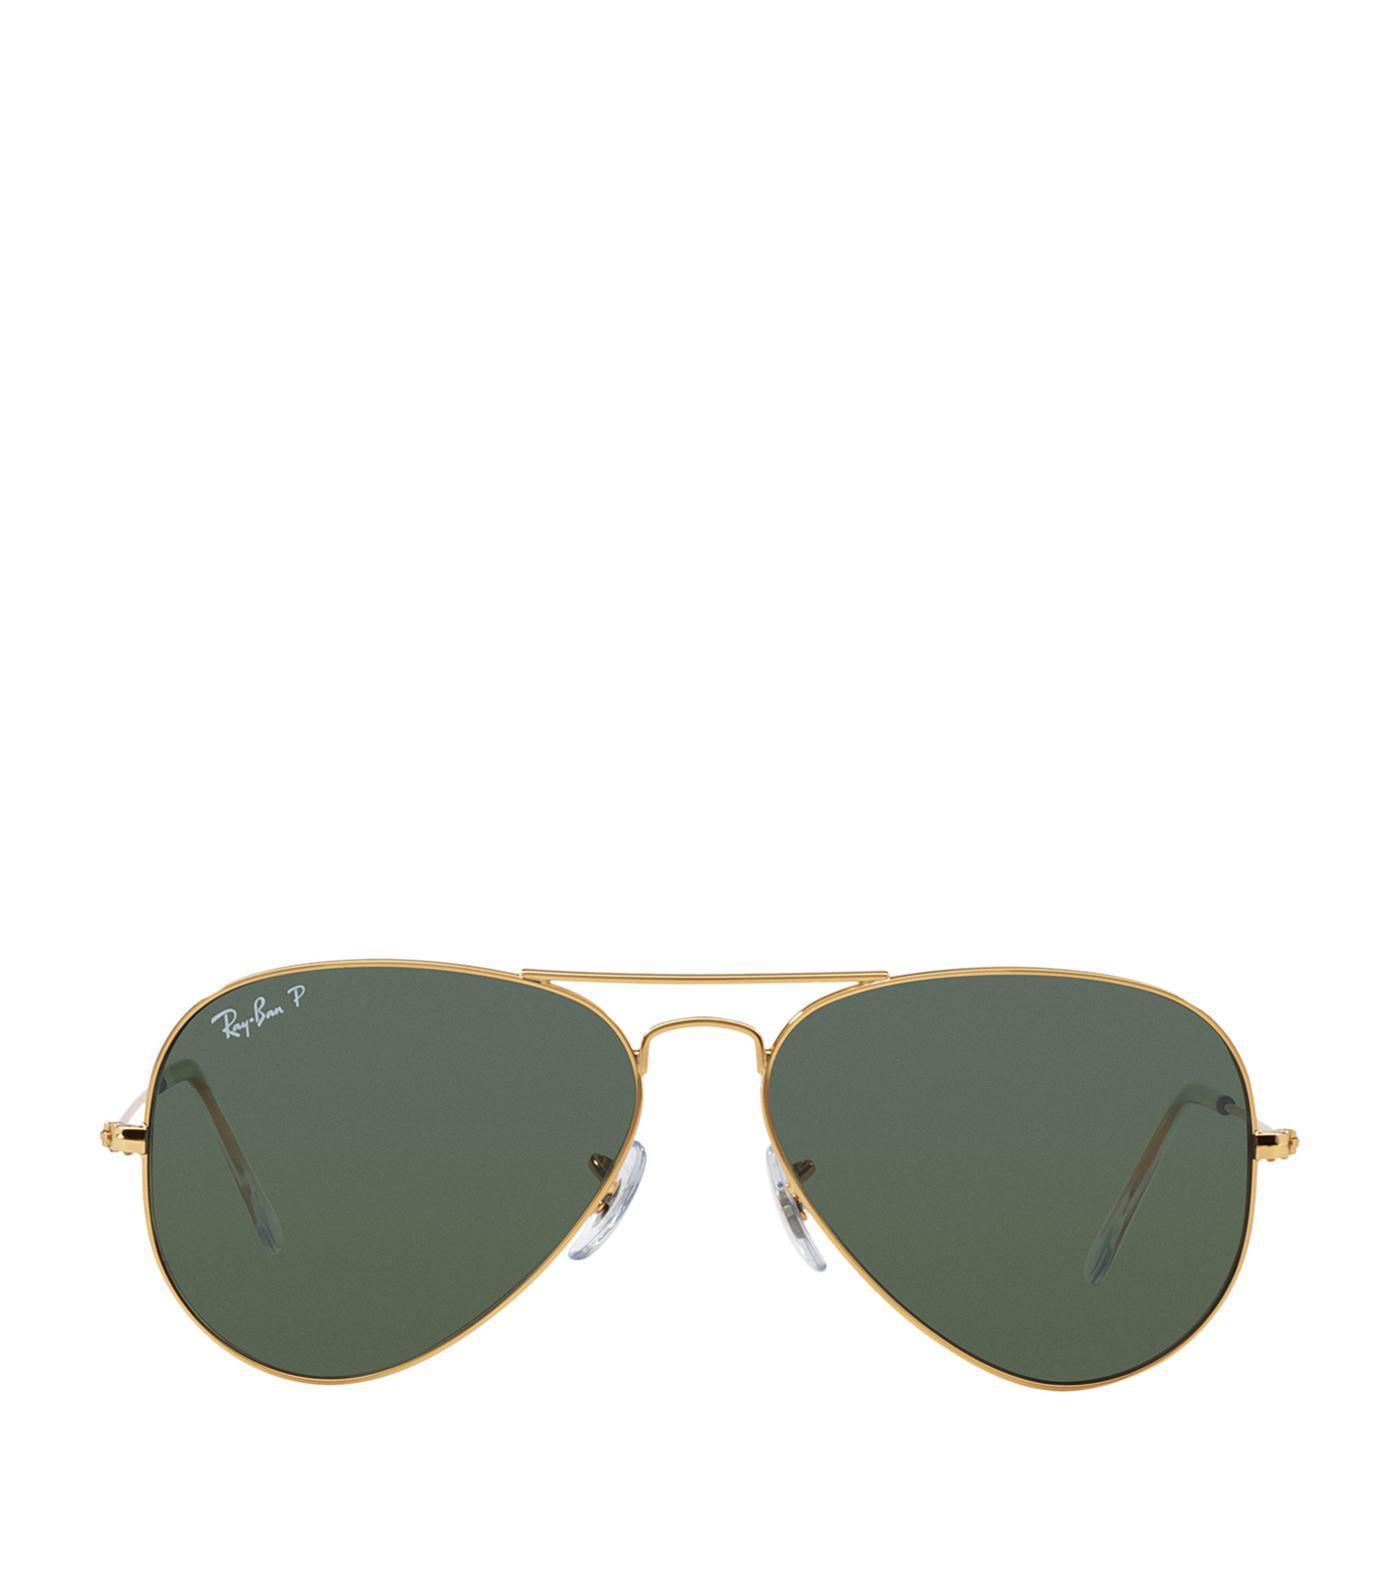 db302cffad Ray-Ban Aviator Sunglasses in Metallic - Save 59% - Lyst